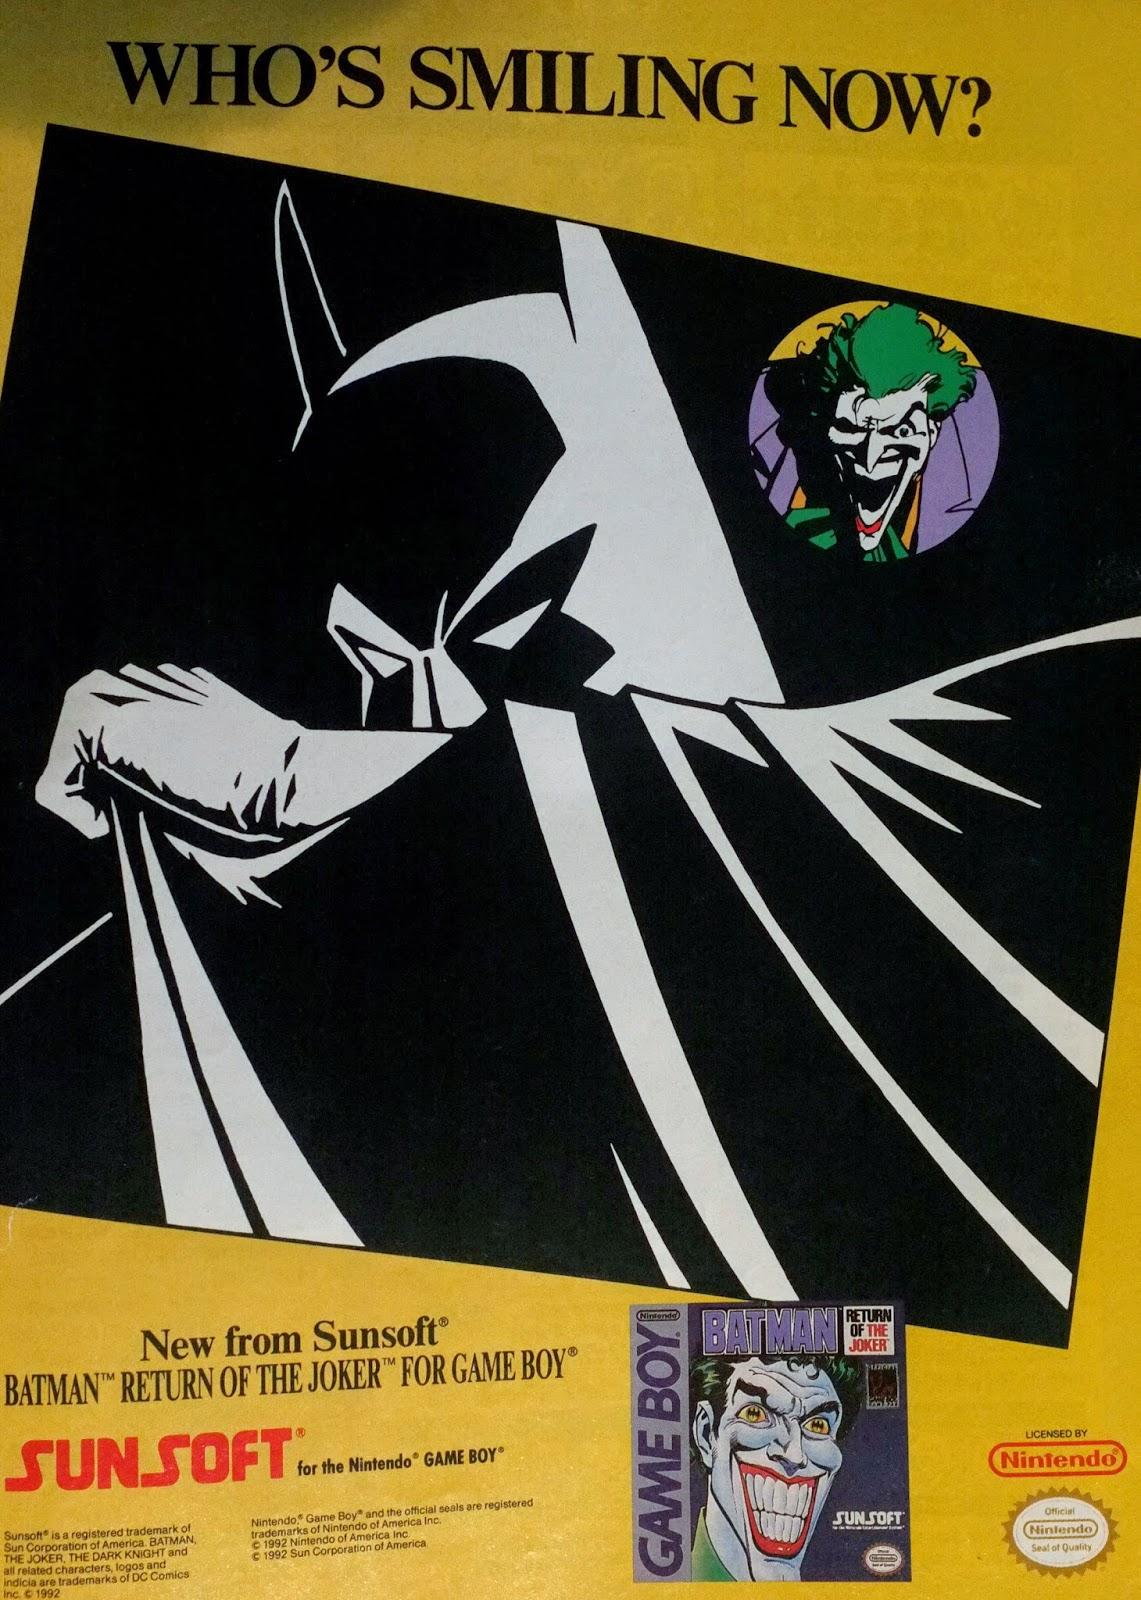 Batman. Return of the Joker for Game Boy advertisement